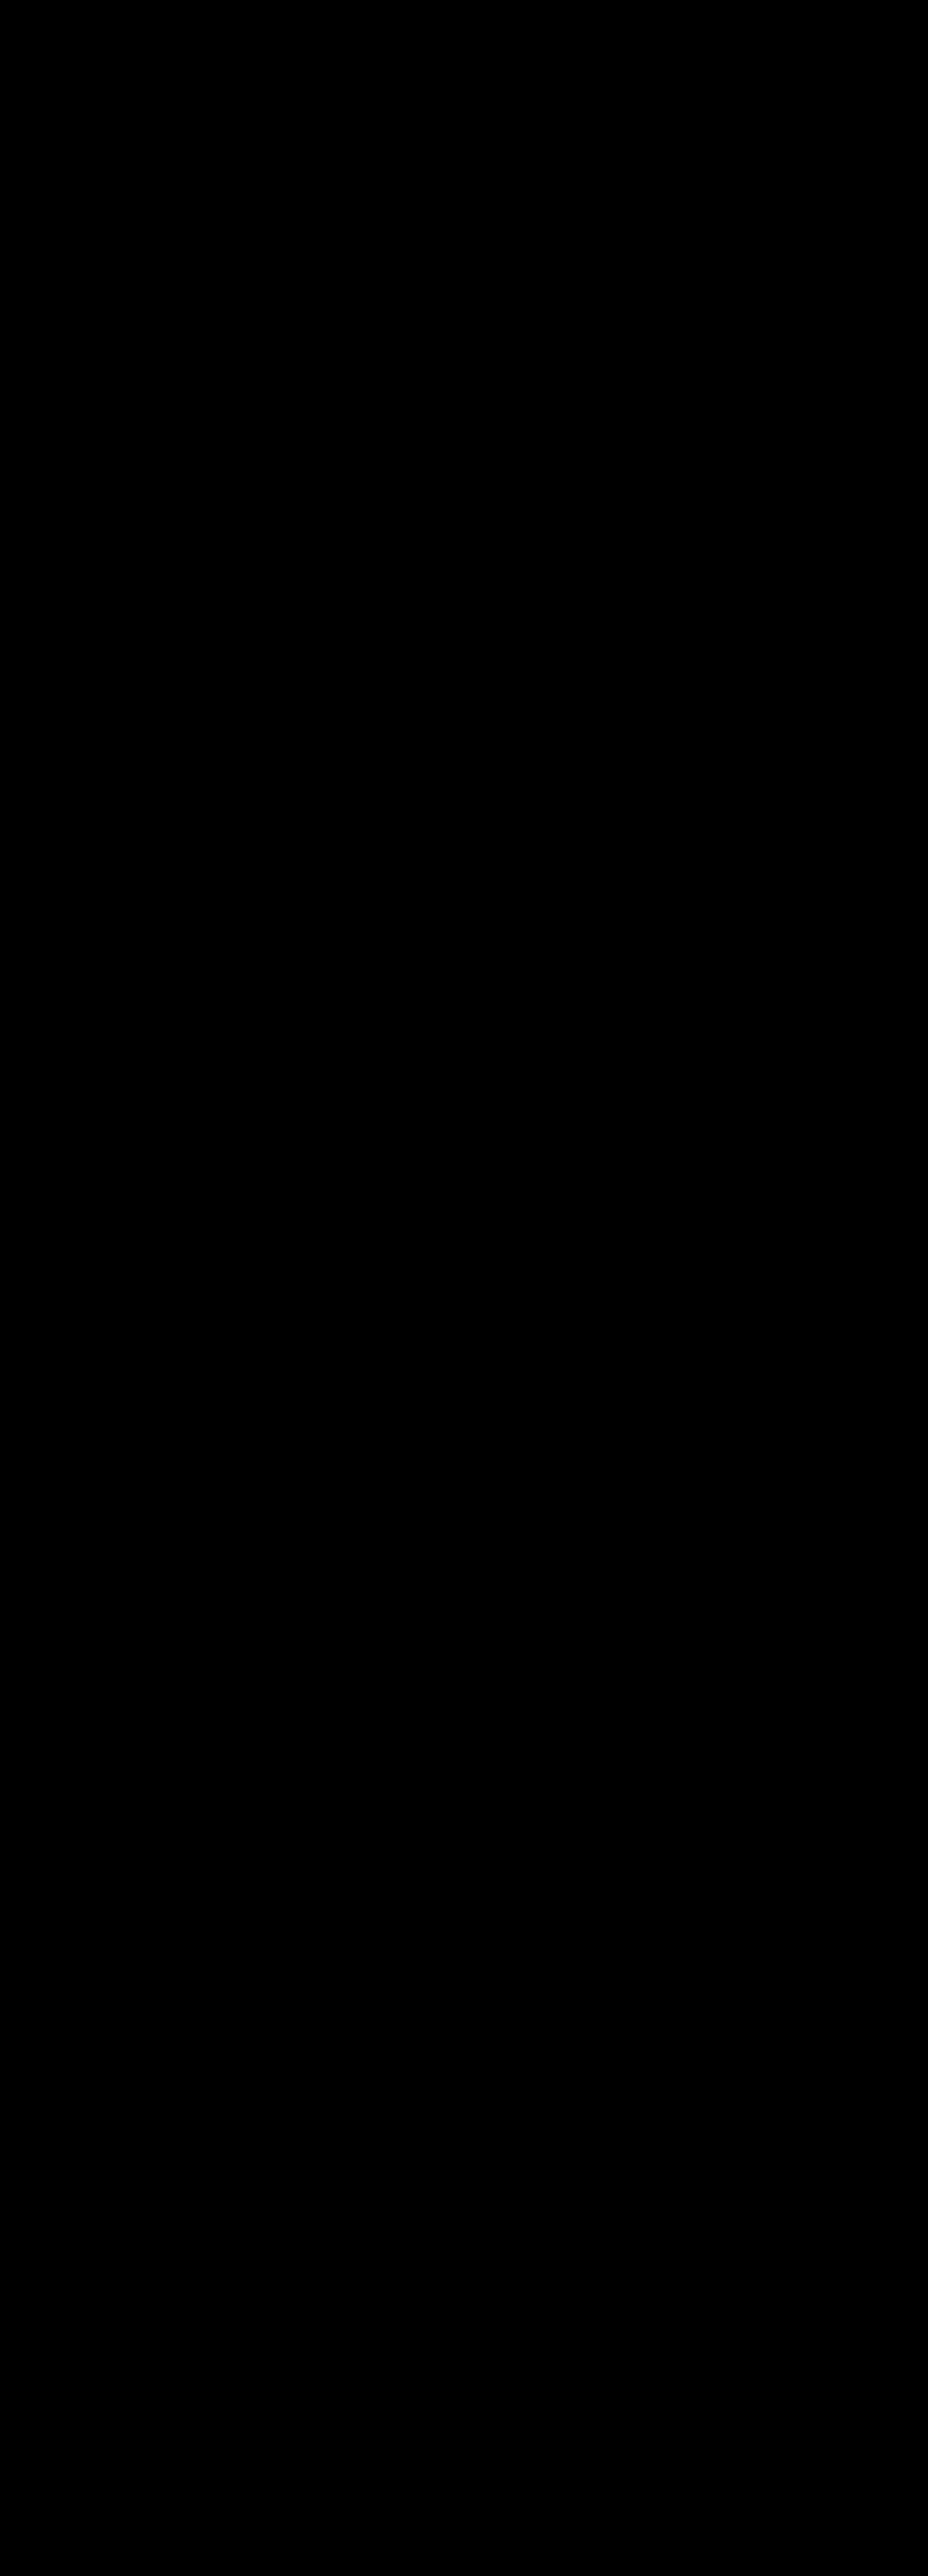 bản vẽ cột trạm bts